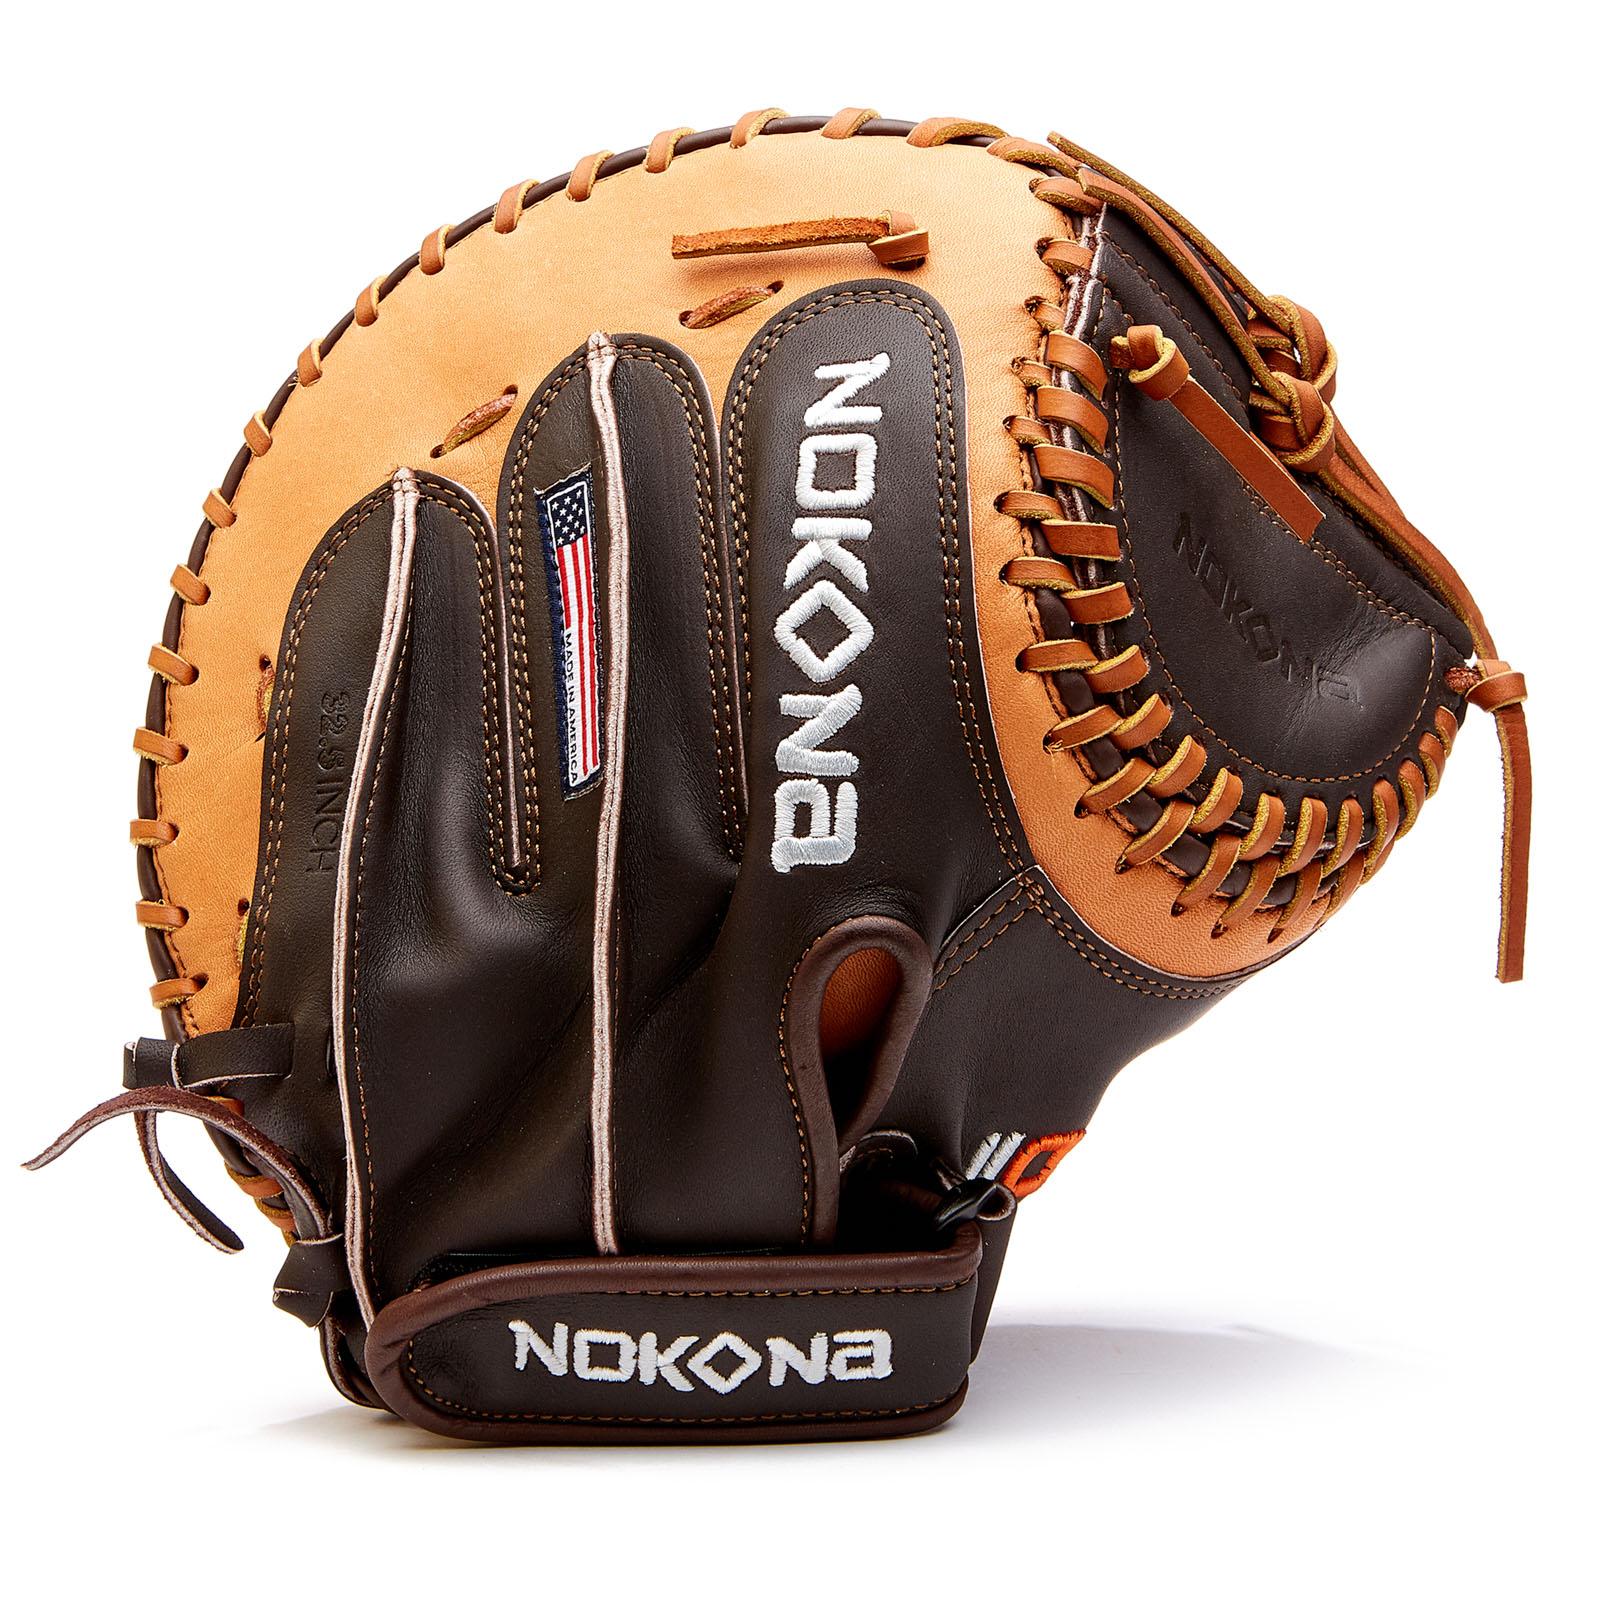 nokona-alpha-fastpitch-32-5-softball-catchers-mitt-right-hand-throw S-V2C-RightHandThrow Nokona 808808894063 AmericanKIP is the finest American steerhide with similar characteristics to Japanese